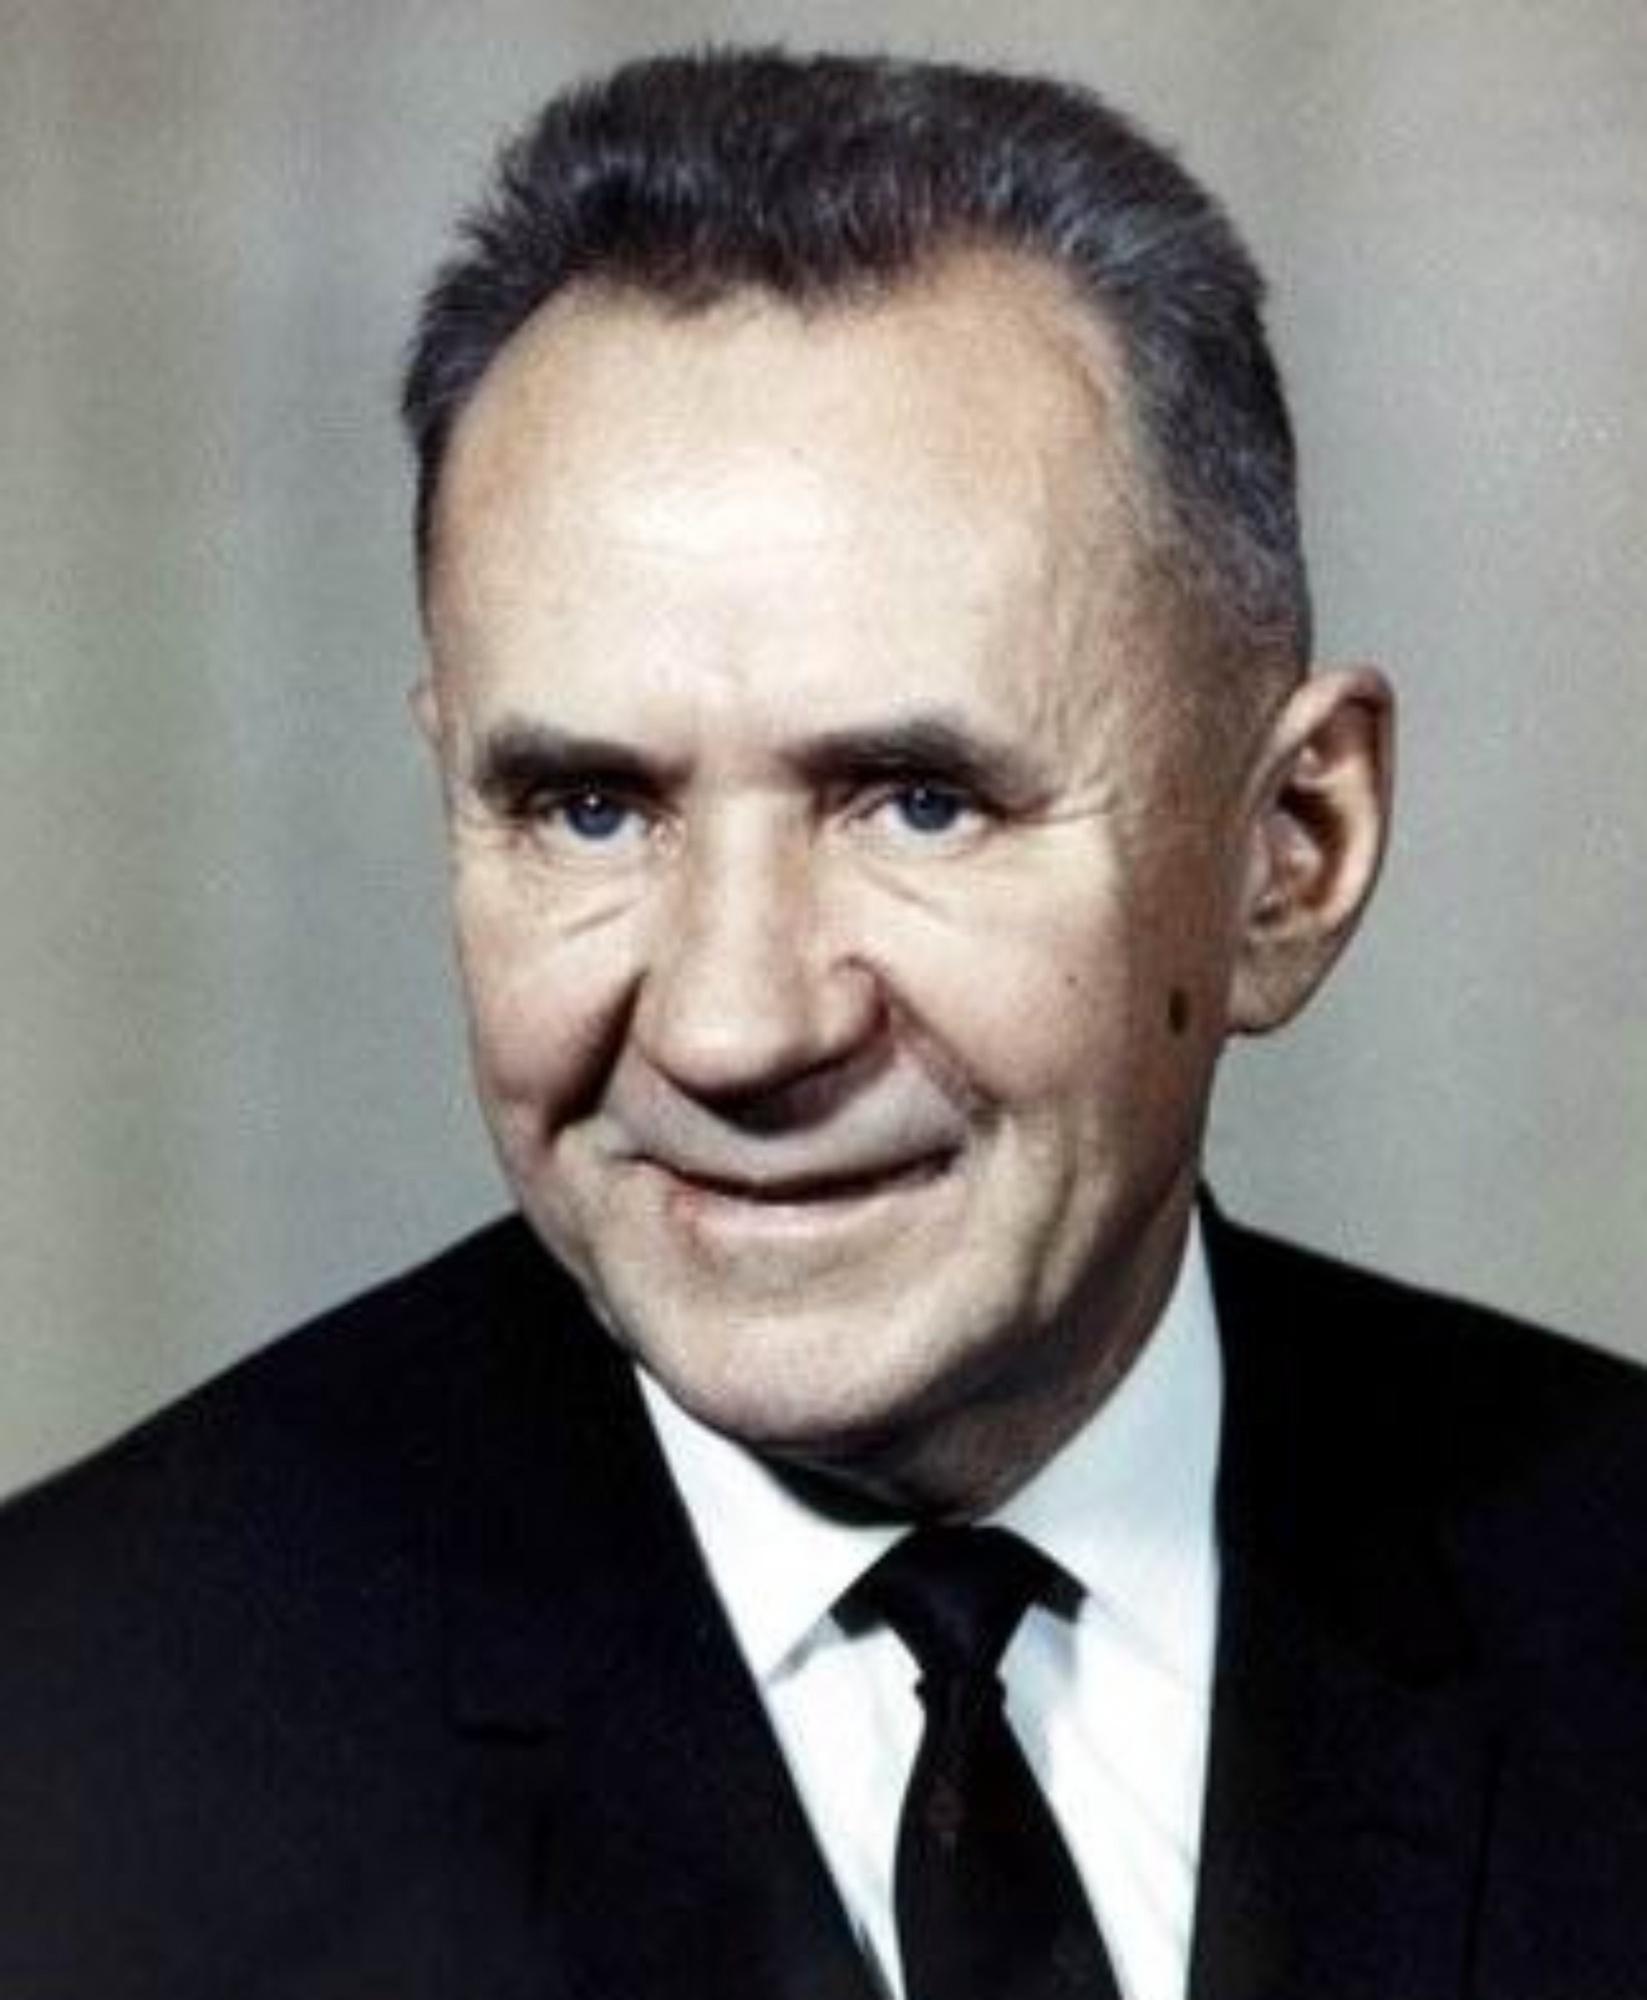 Aleksej Nikolaevič Kosygin